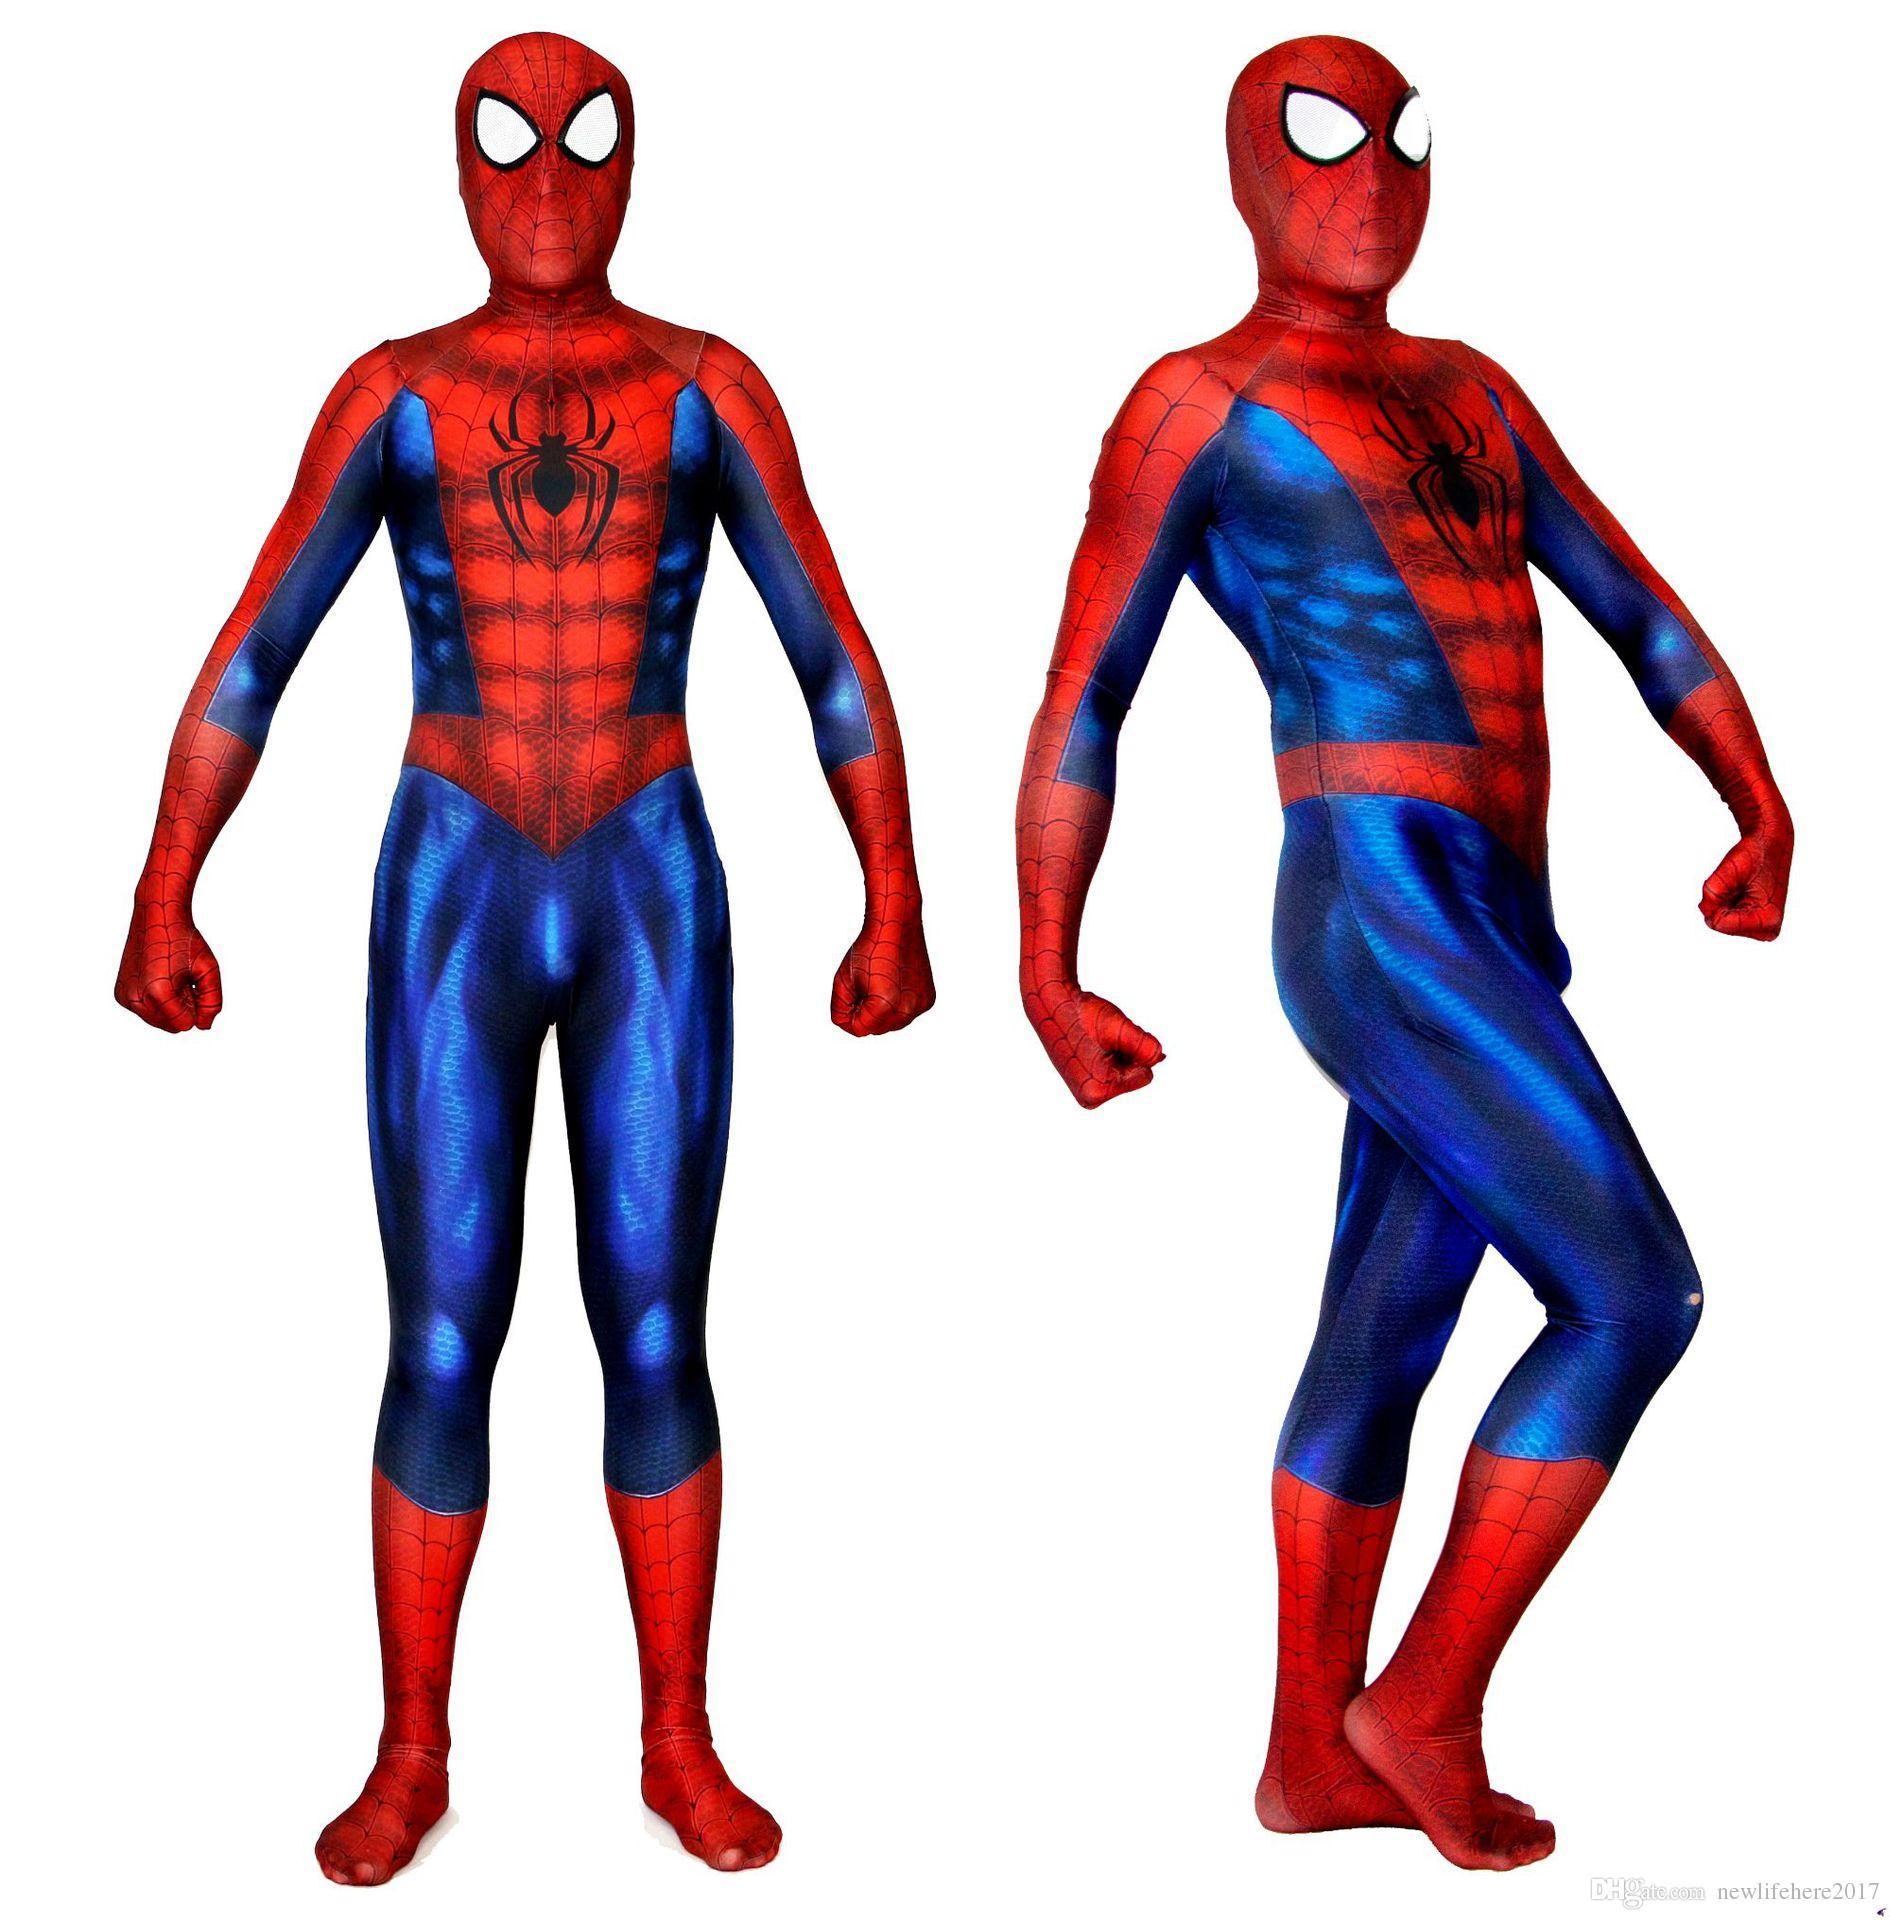 Spider-Man Traje Lycra 3D Spider Imprimir Terno Spandex Homem-Aranha Bodysuit Cosplay